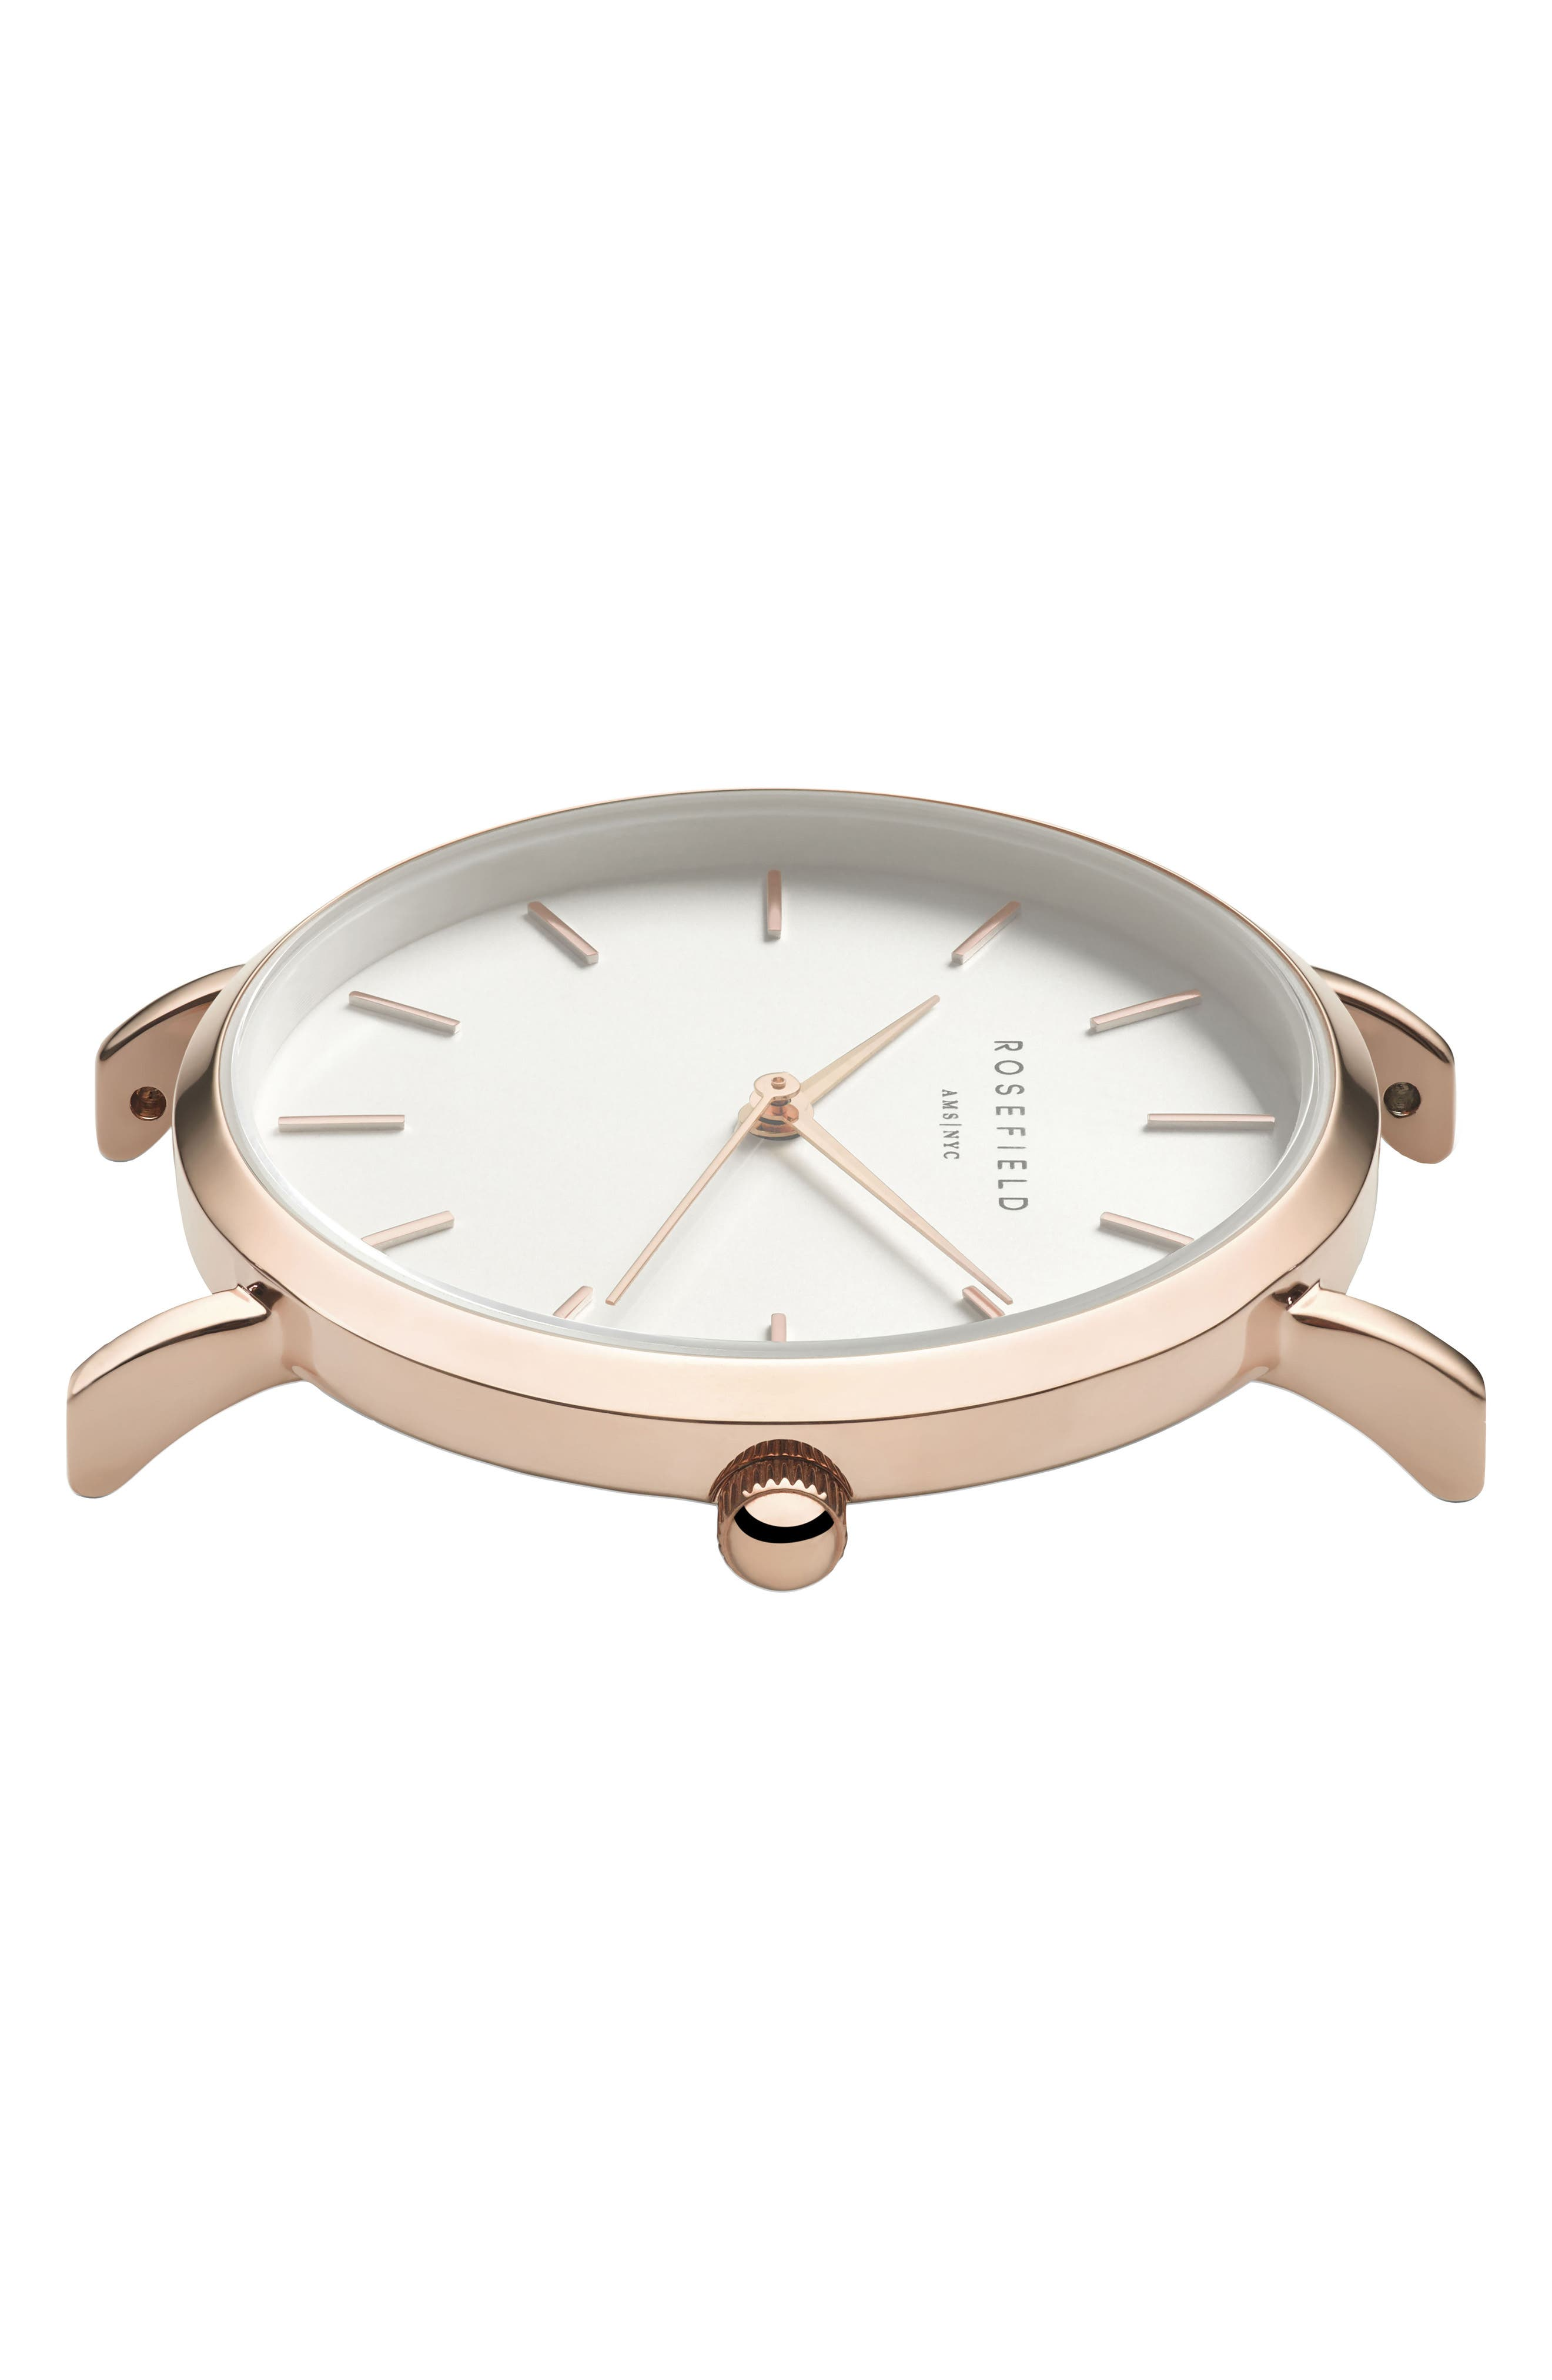 Holiday Leather Strap Watch & Bracelet Gift Set, 33mm,                             Alternate thumbnail 2, color,                             Pink/ Rose Gold